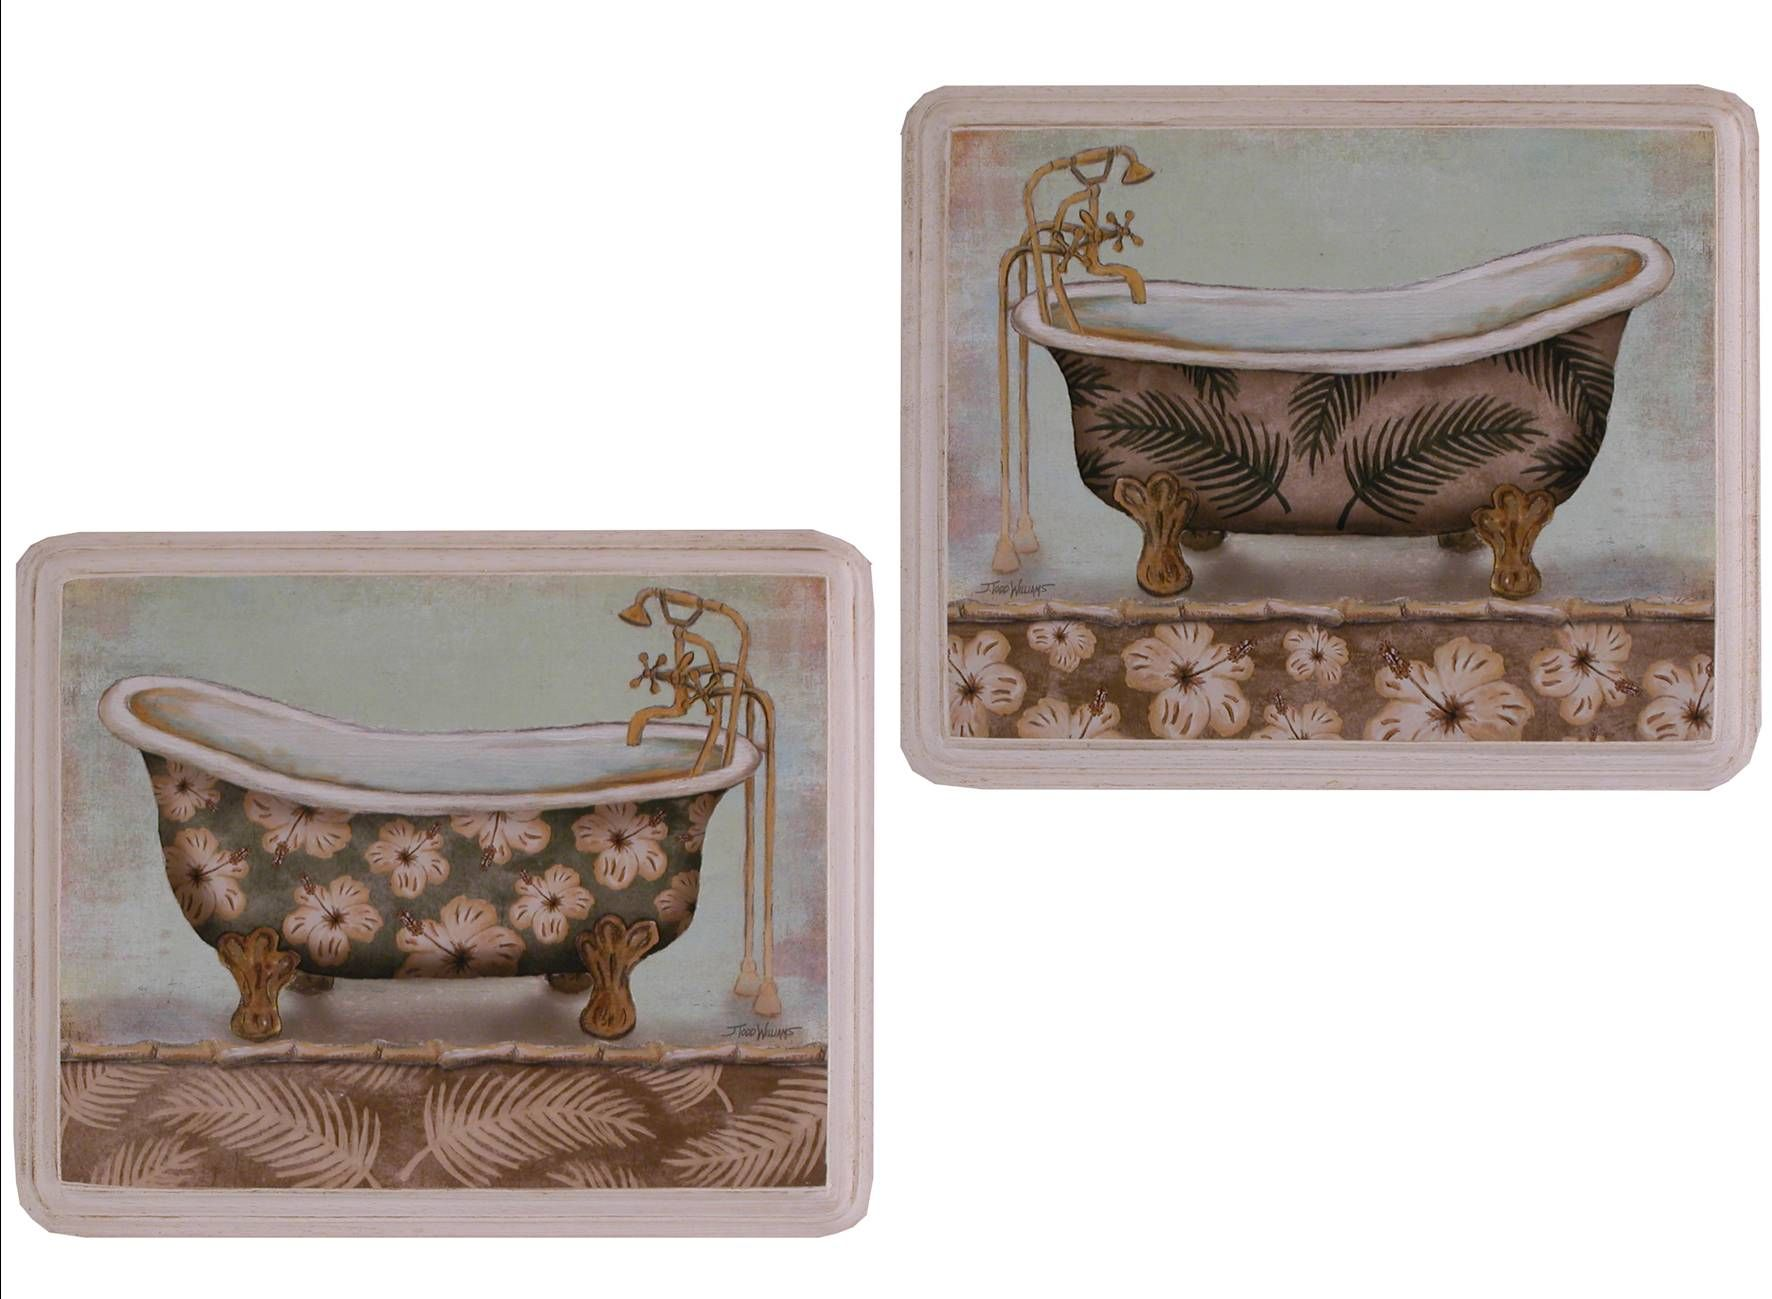 I quadri in legno raffiguranti vasche da bagno stravaganti si ...